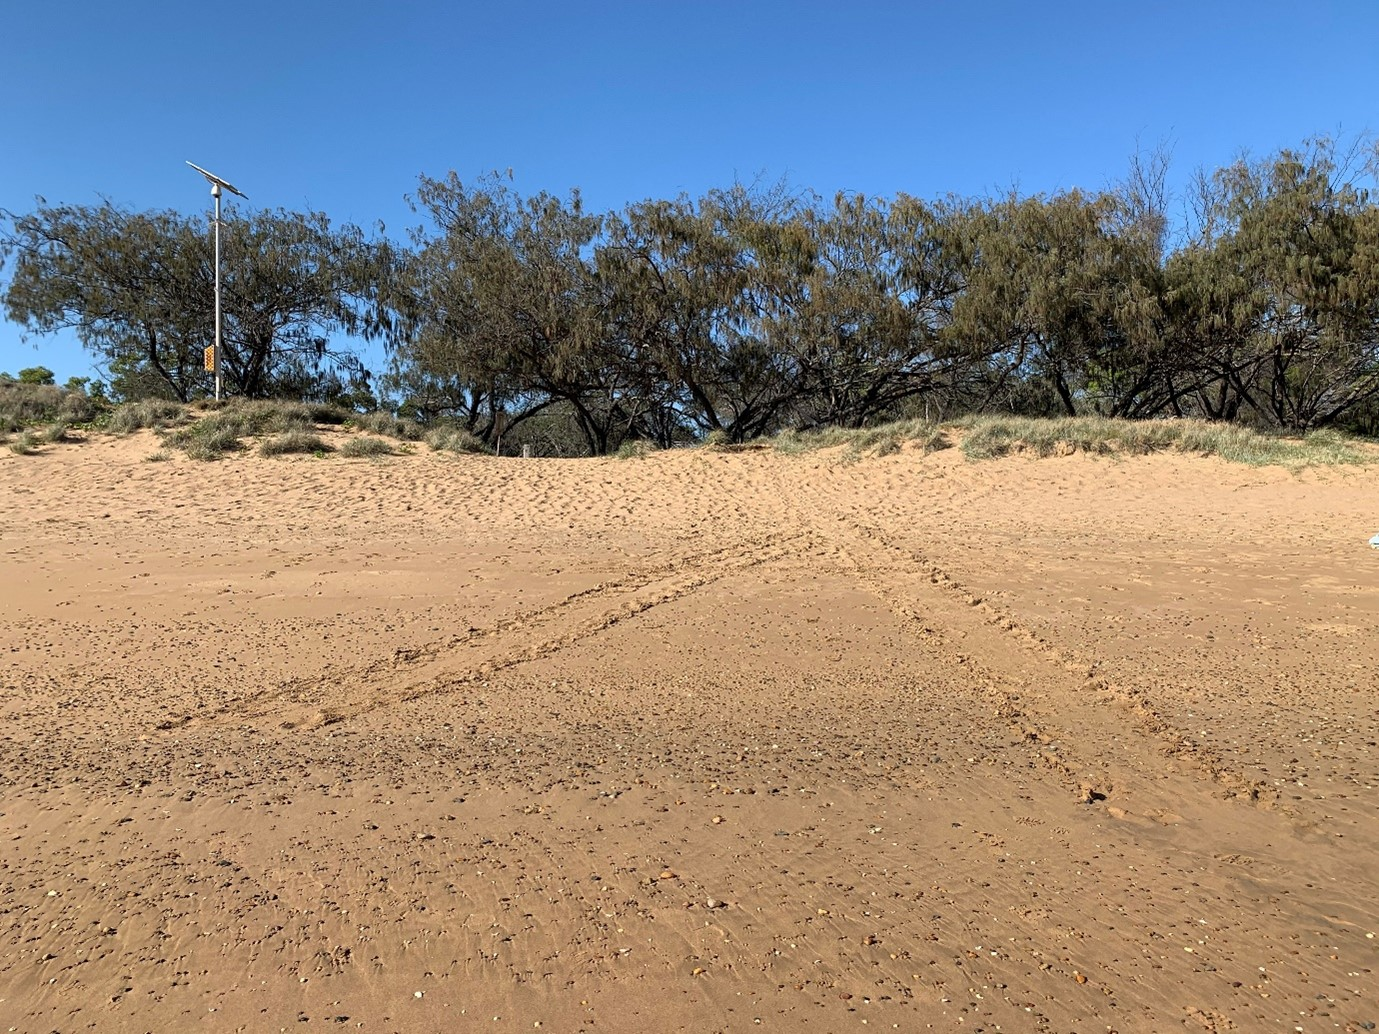 Image of Loggerhead turtle tracks which stretcj across Mon Repos beach